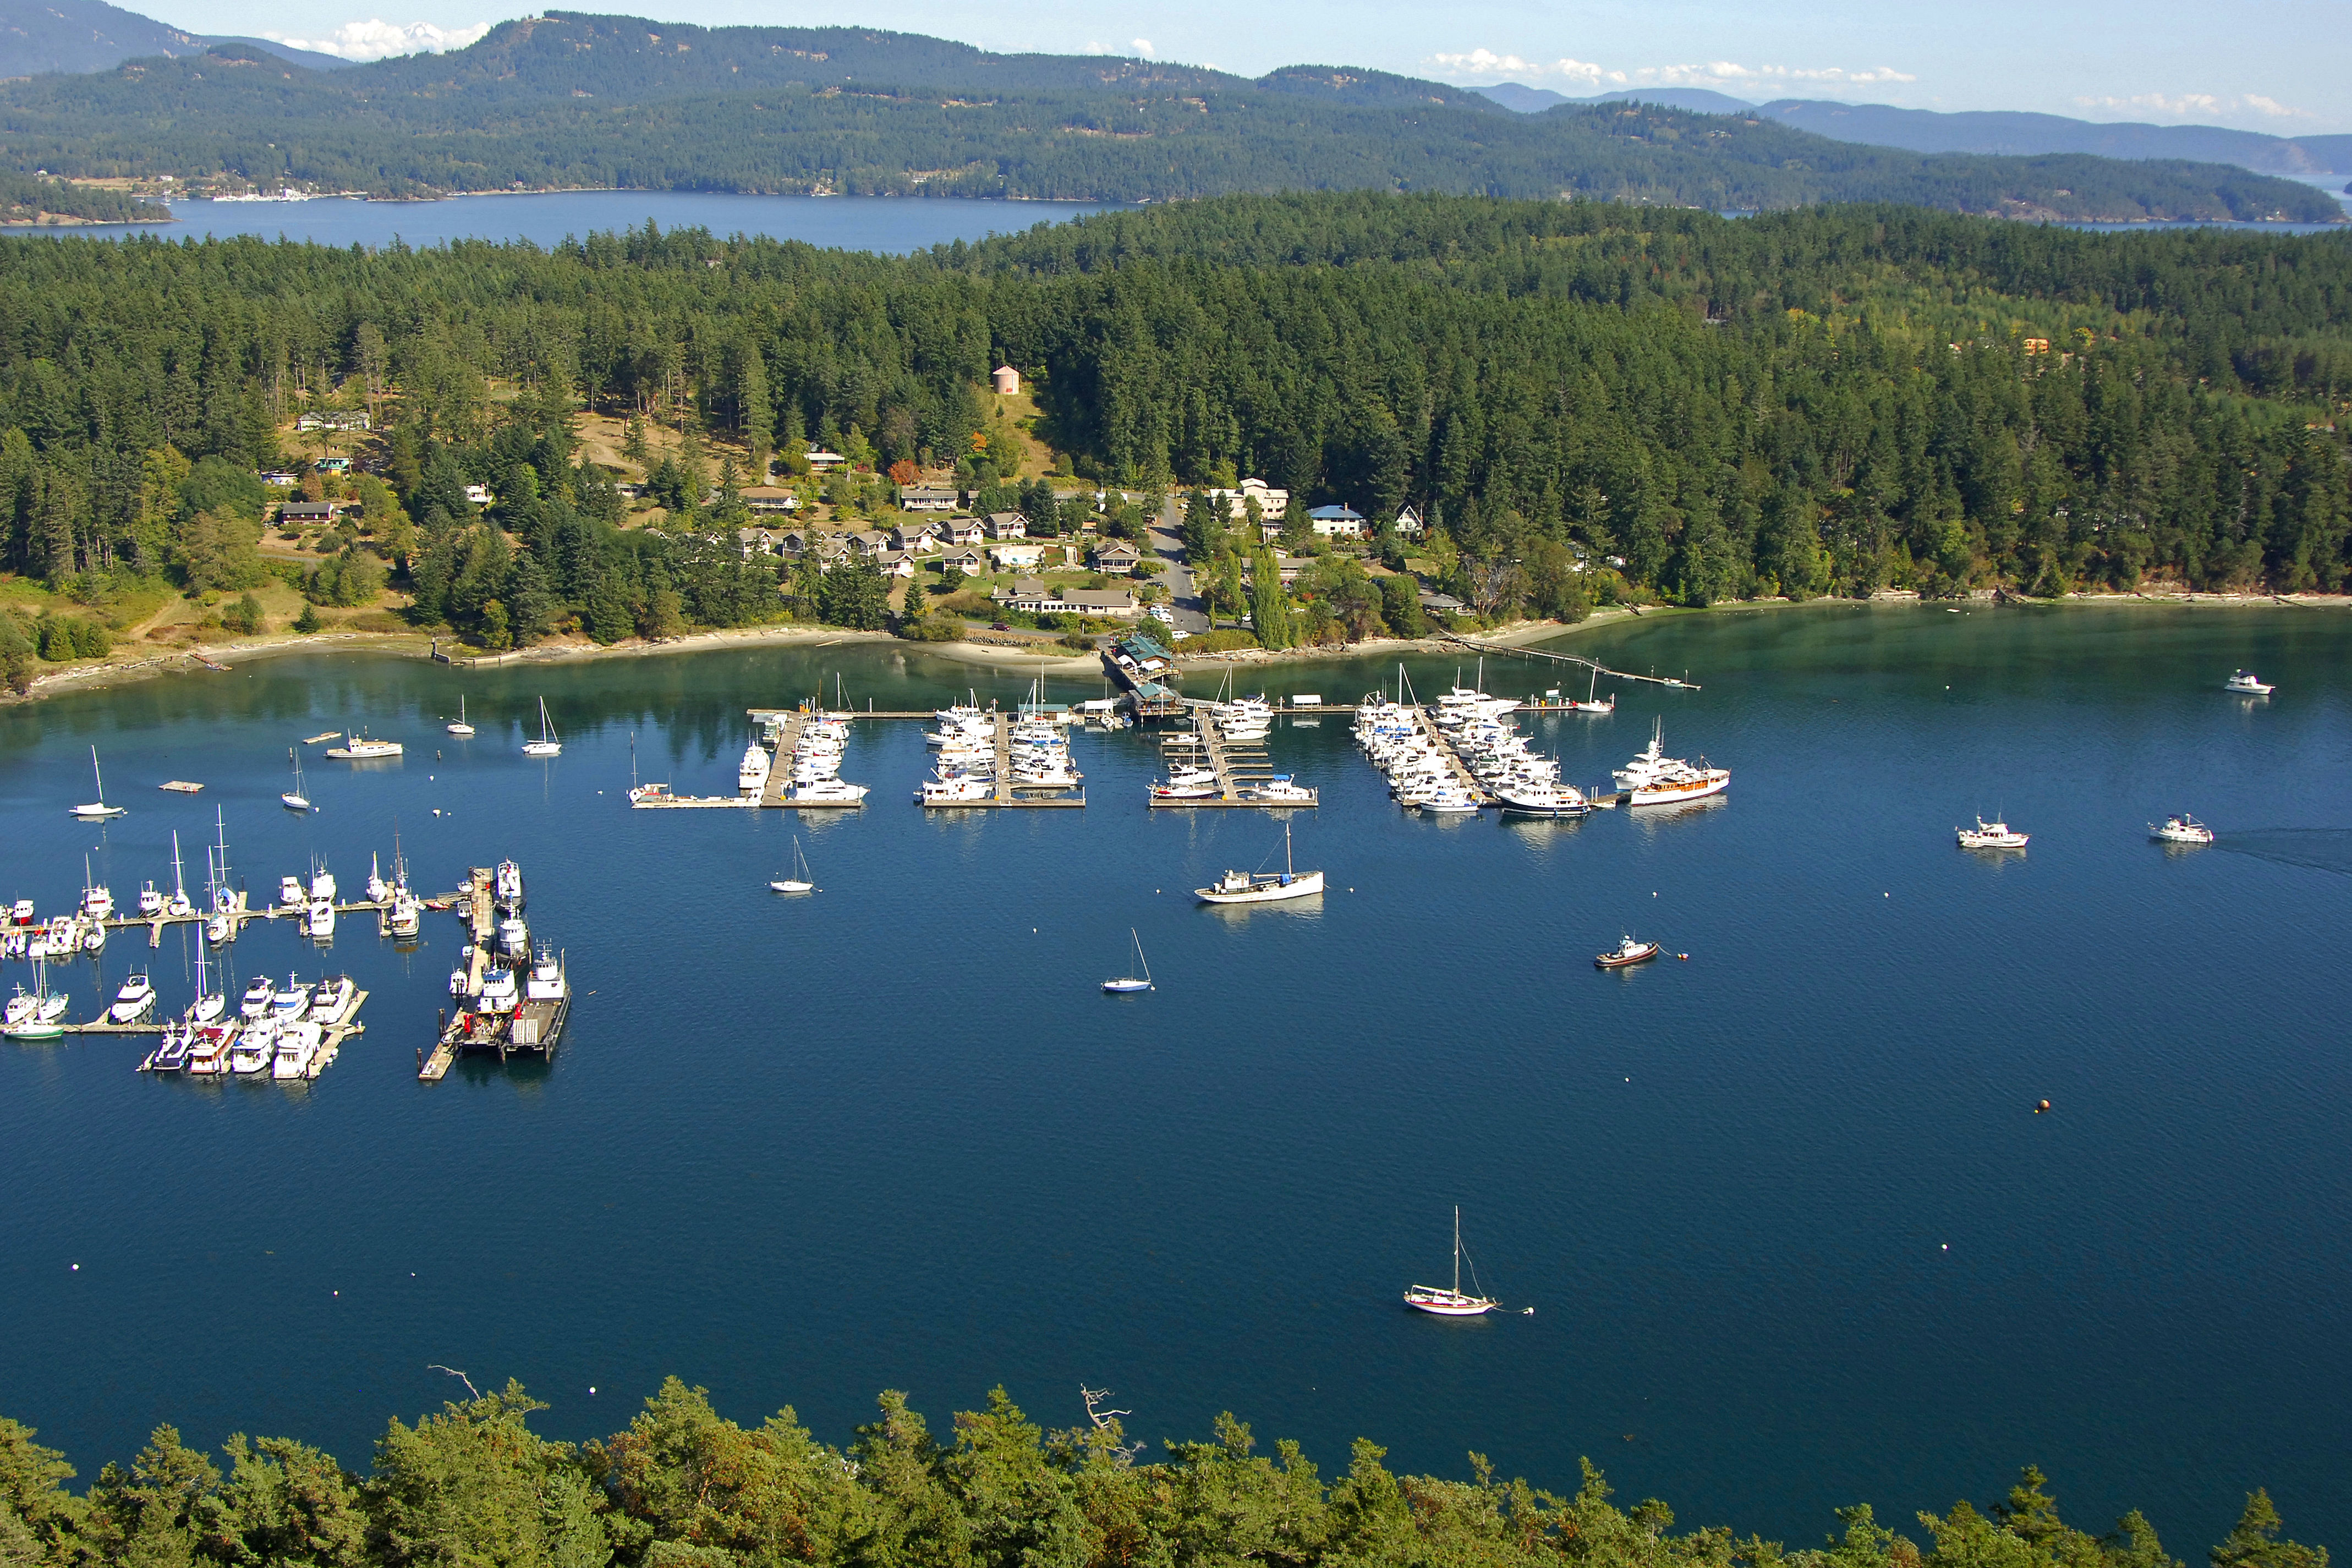 deer harbor Free breakfast, fireplace, orcas island, vacation rental, private cottage, deer harbor.